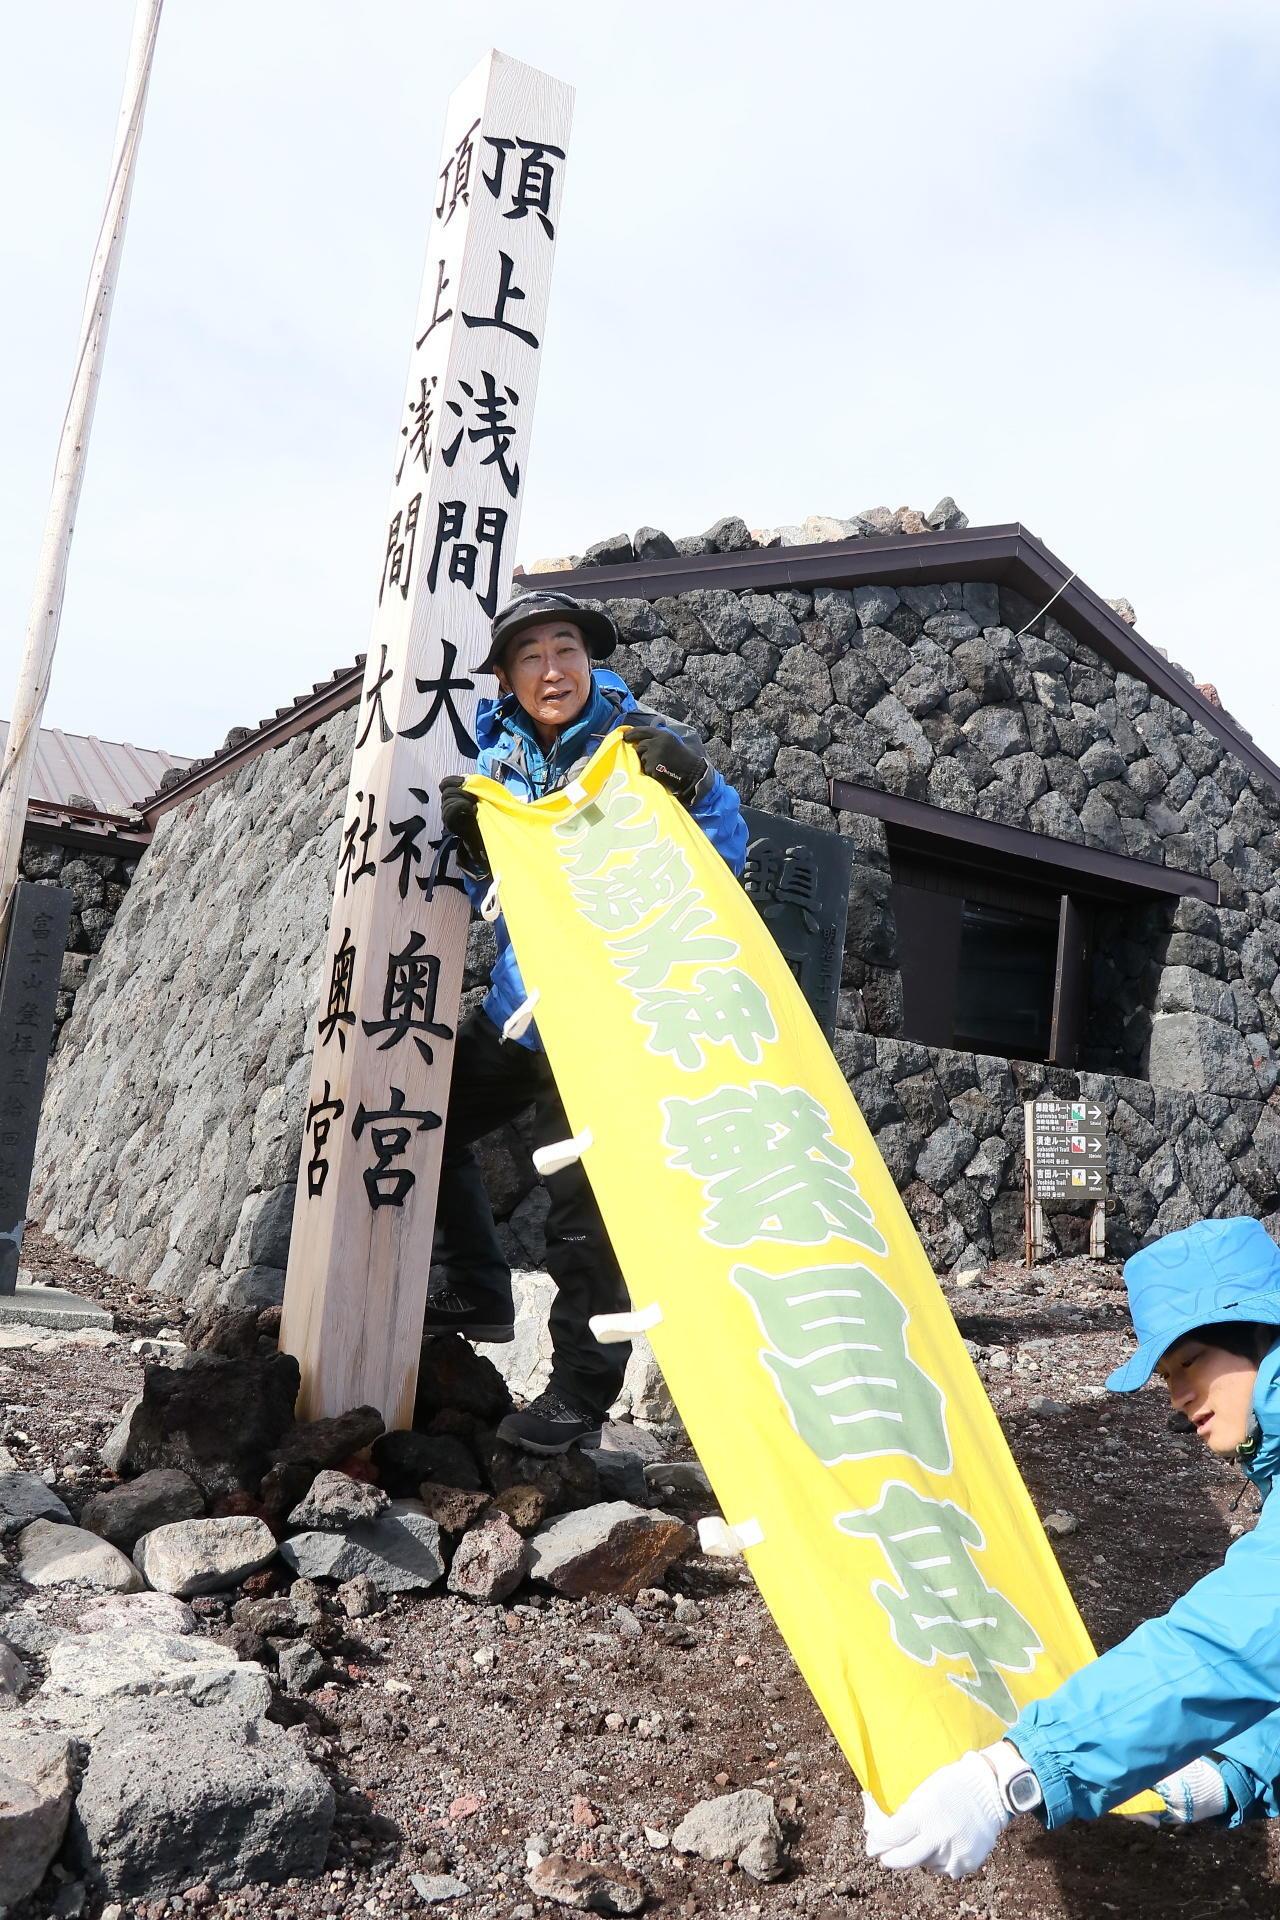 http://news.yoshimoto.co.jp/20170714101827-8f2b03a03d6a0b45c905f0769a1fecd7457e2384.jpg